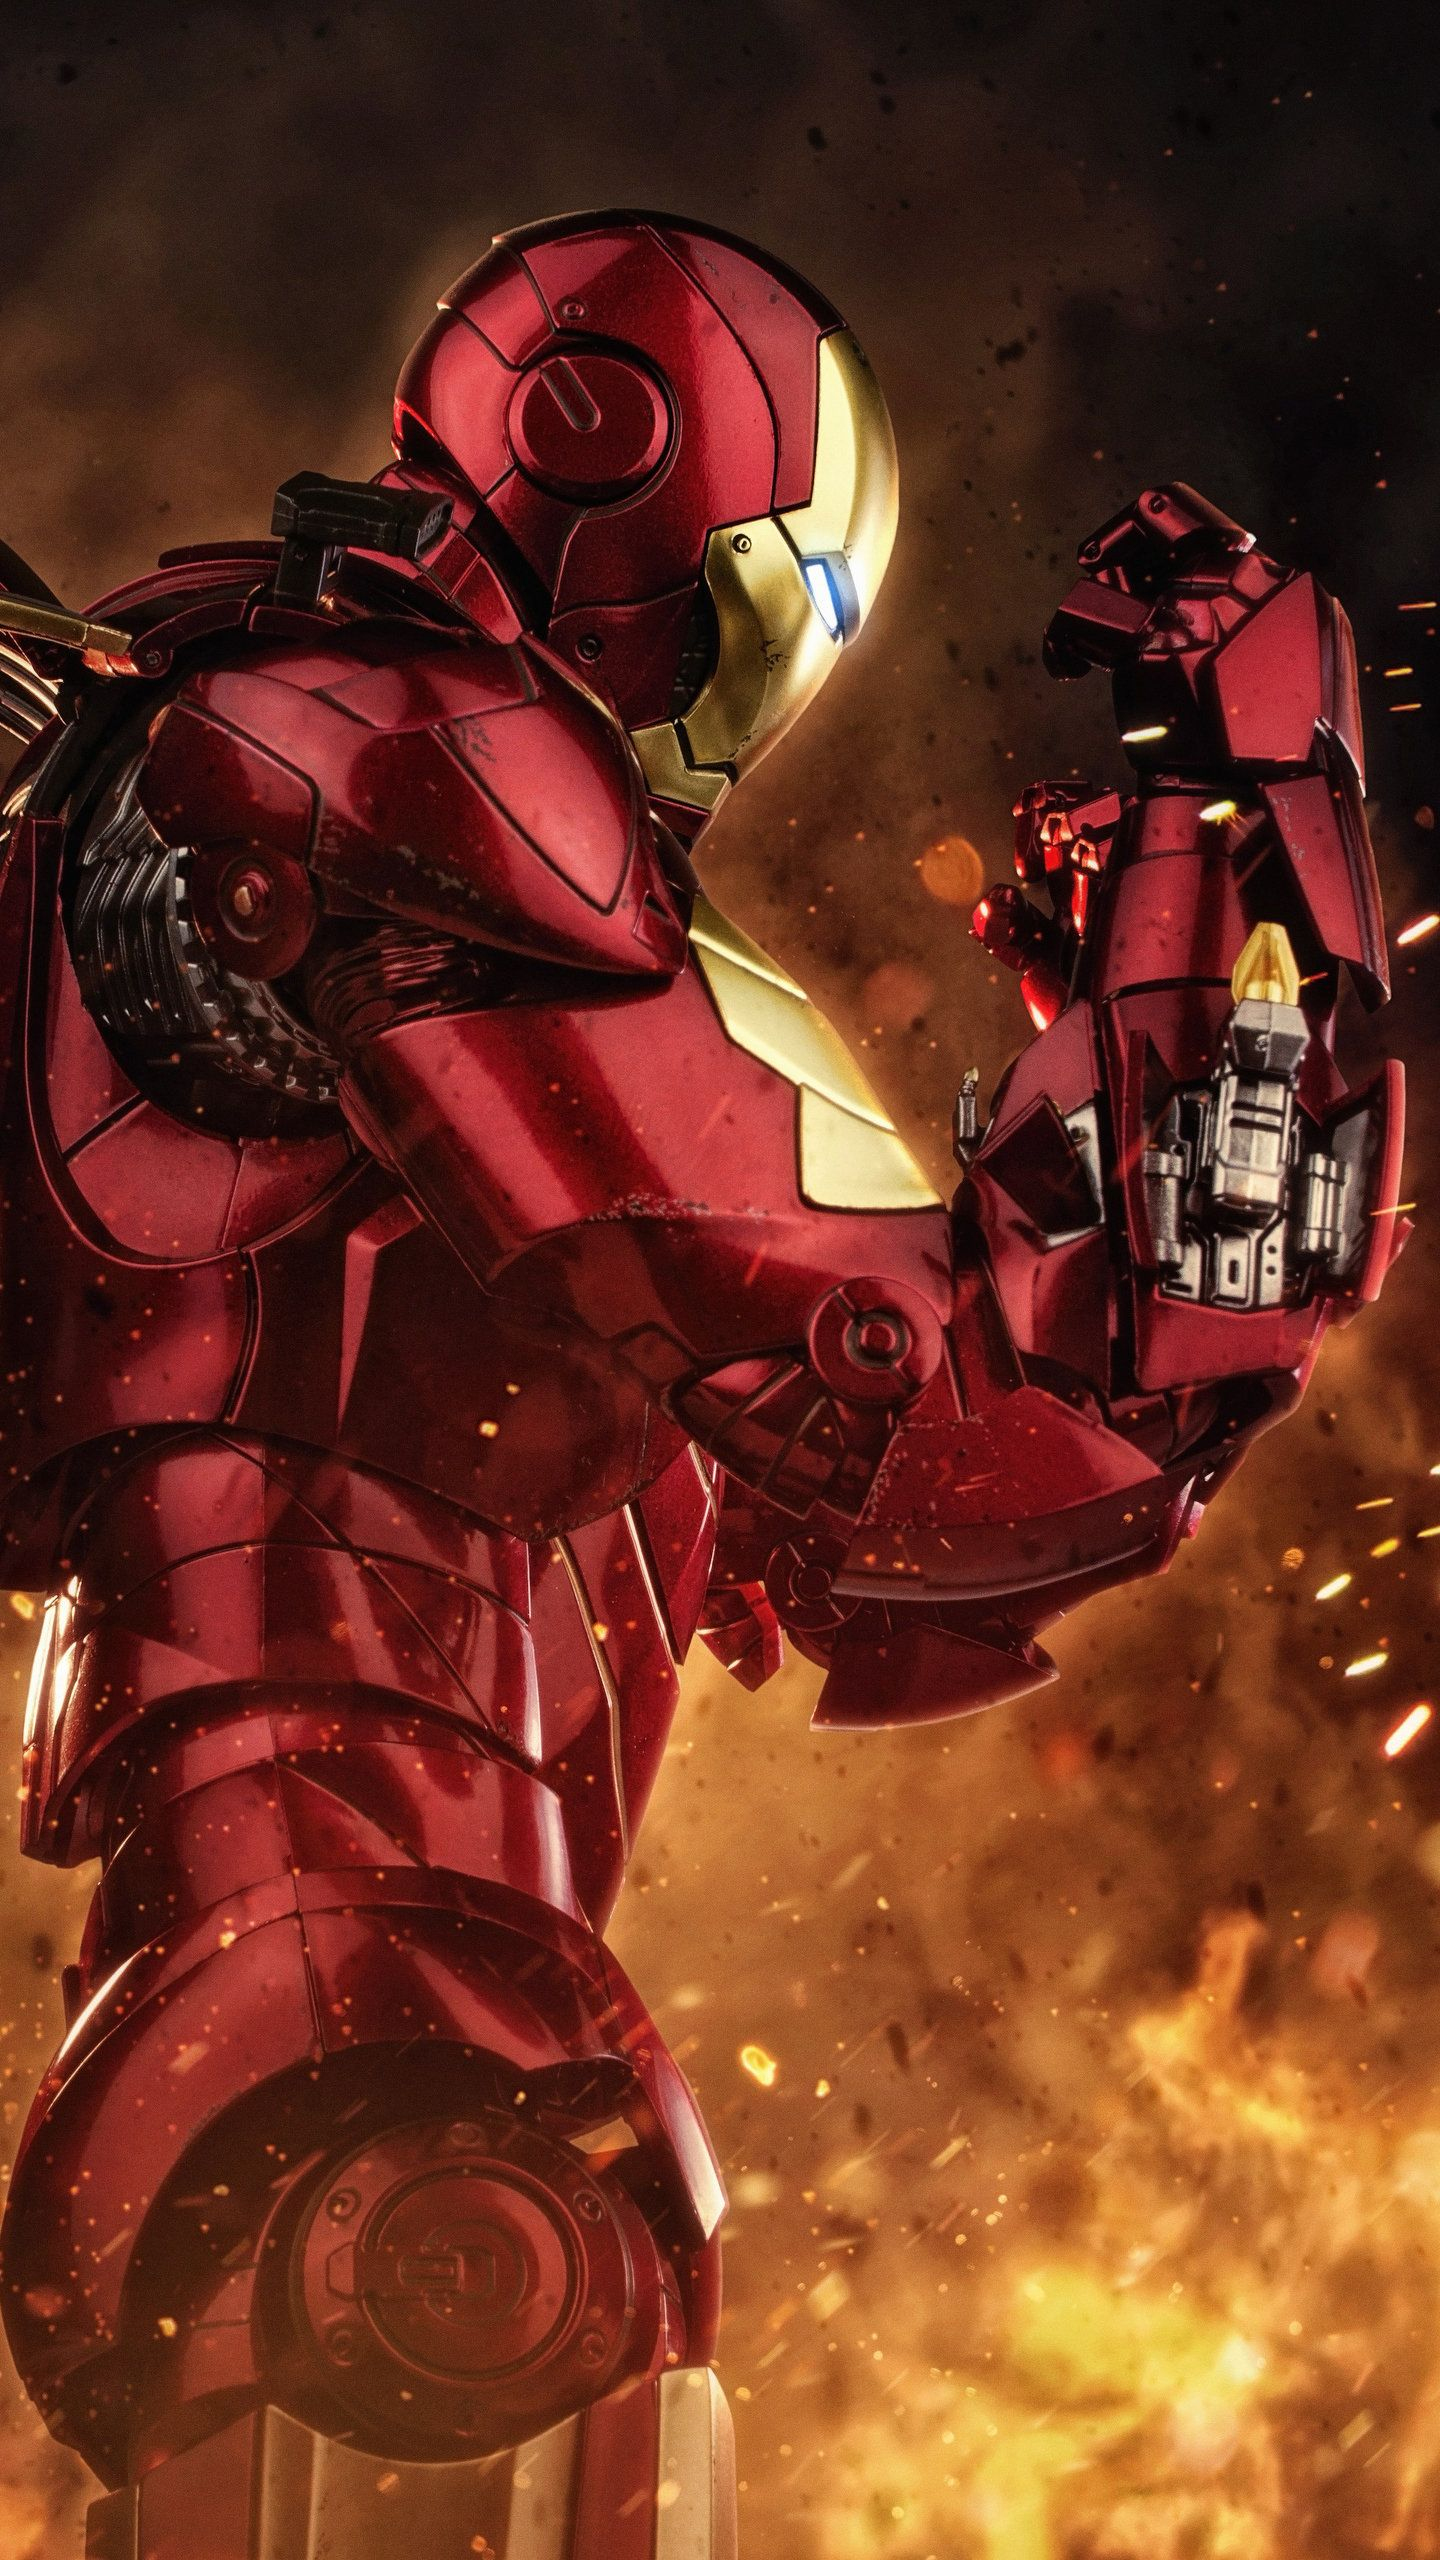 4k Iron Man 2019 Hd Superheroes Wallpapers Photos And Pictures Iron Man Art Iron Man Iron Man Avengers Ultra hd iphone ultra hd iron man